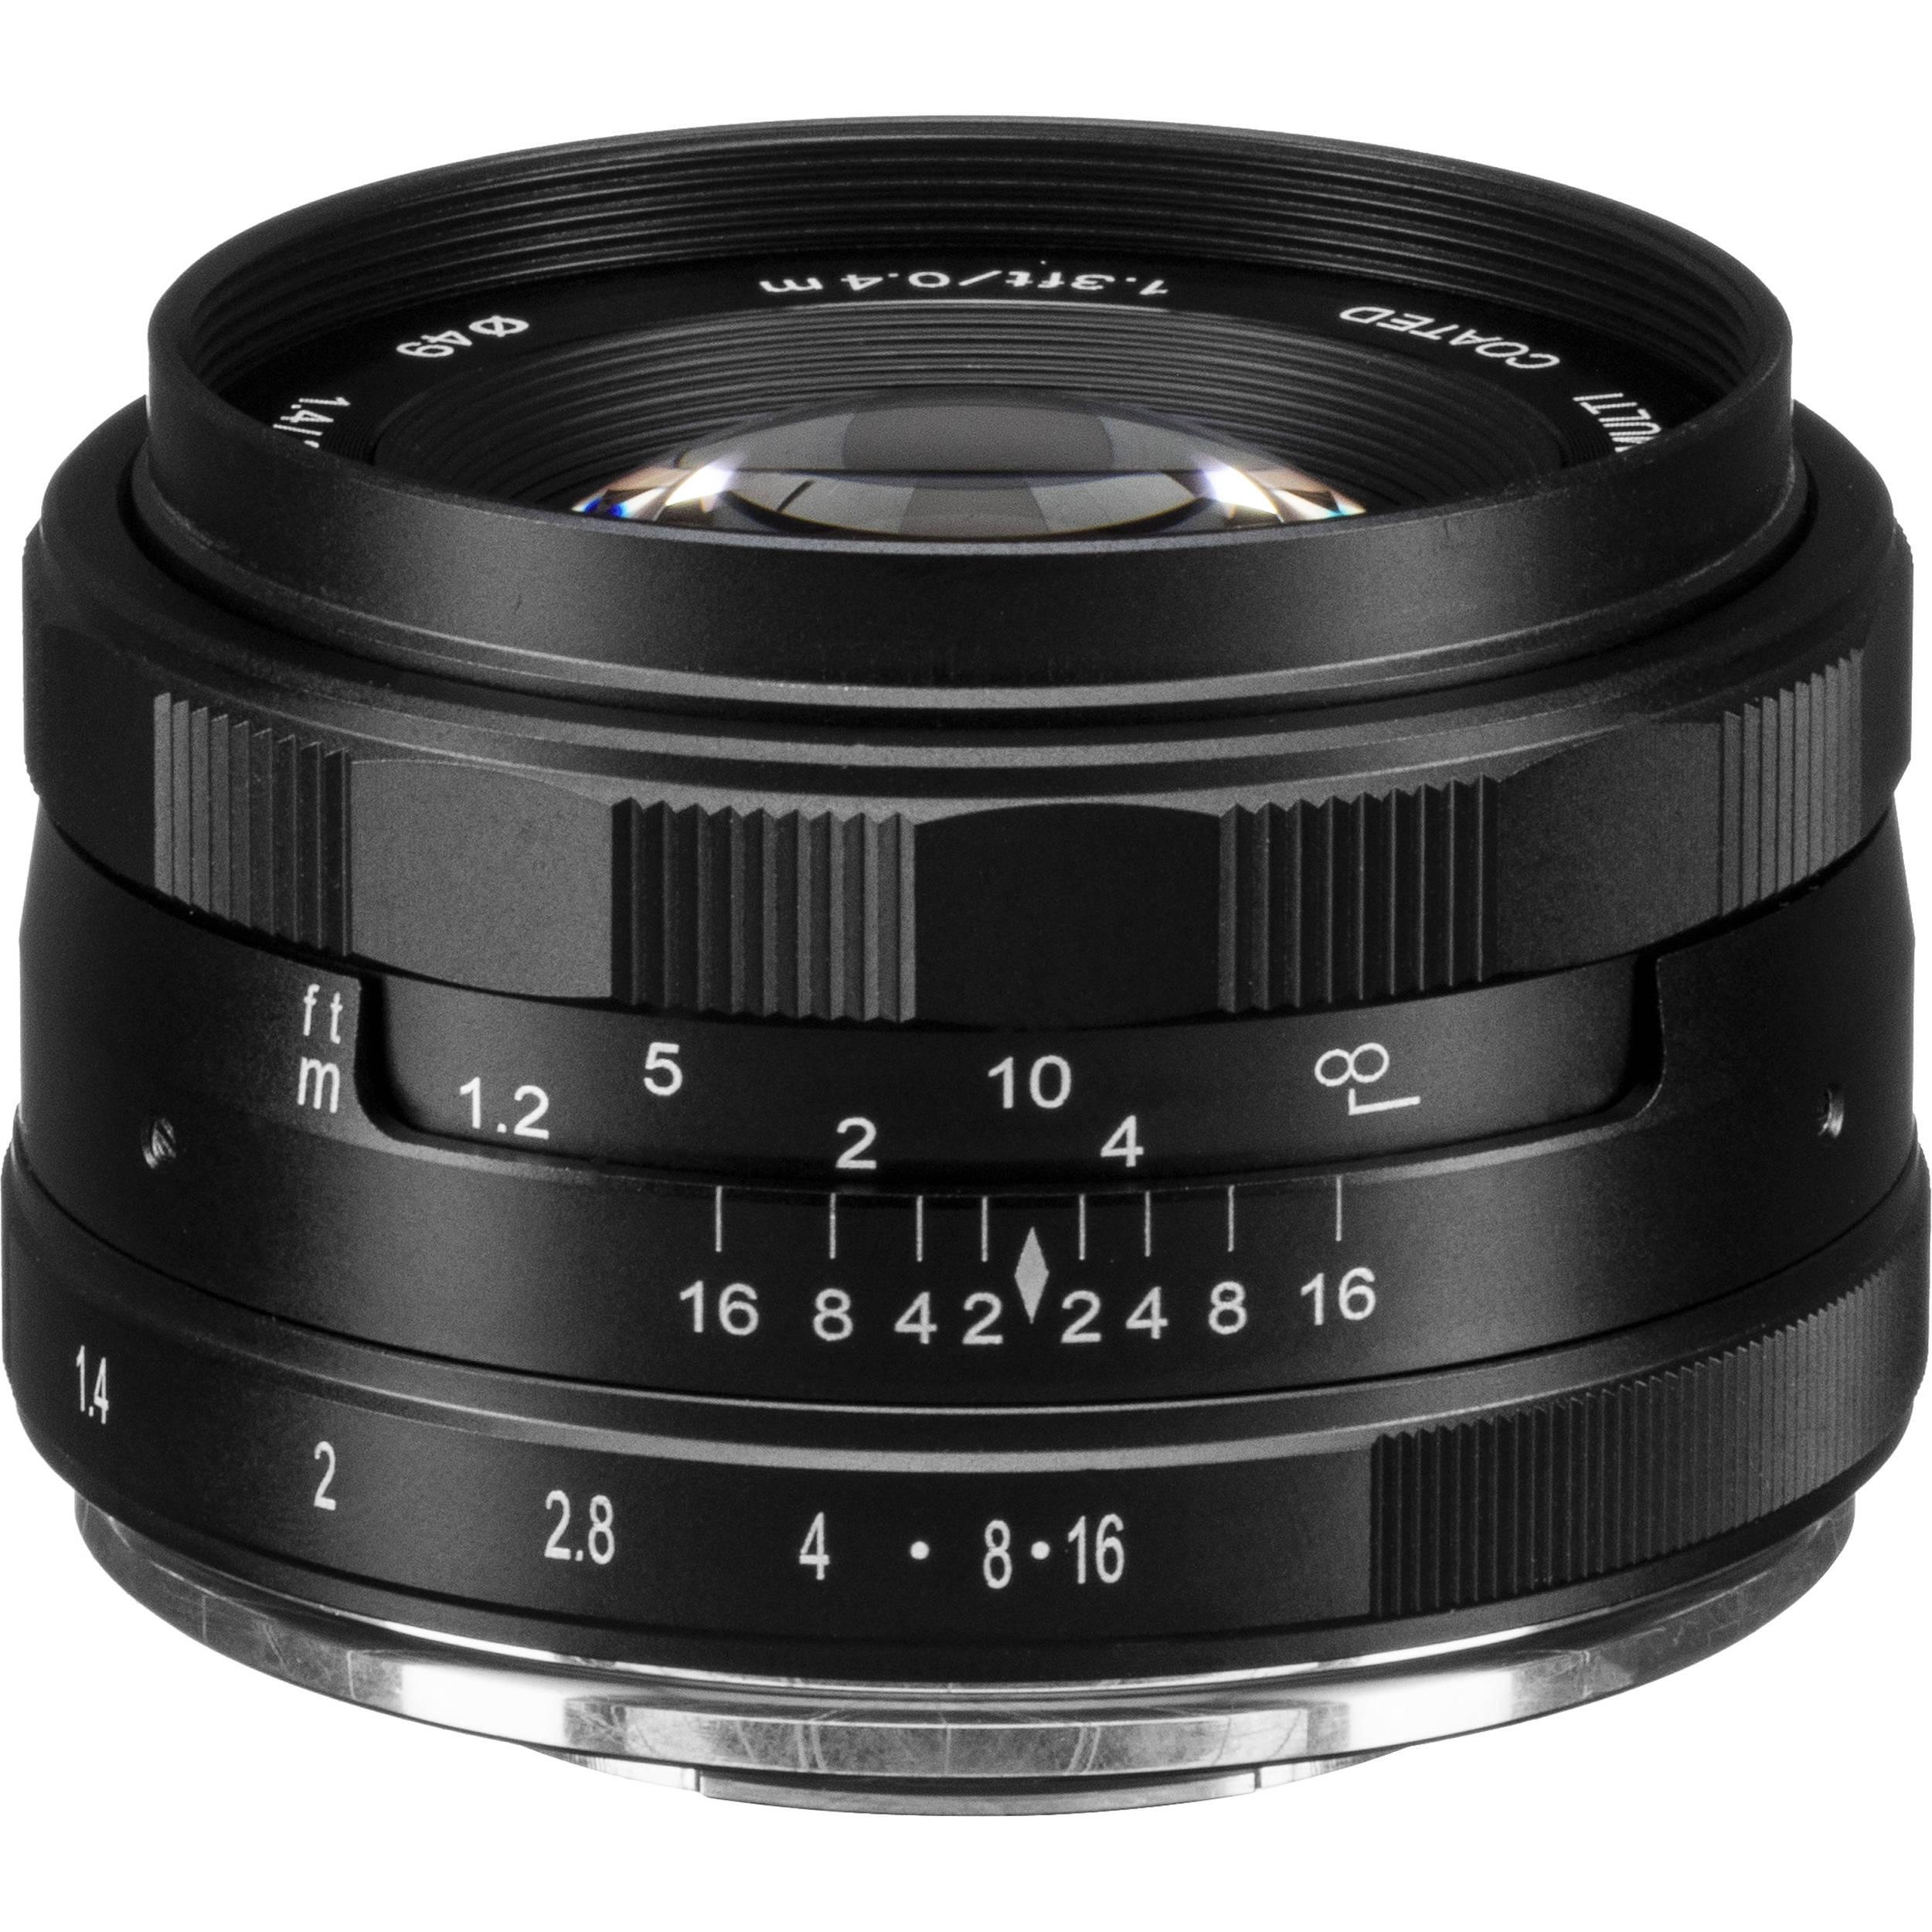 Gadget Place 52mm Diameter Extension Tube 21mm Long for Nikon ES-1